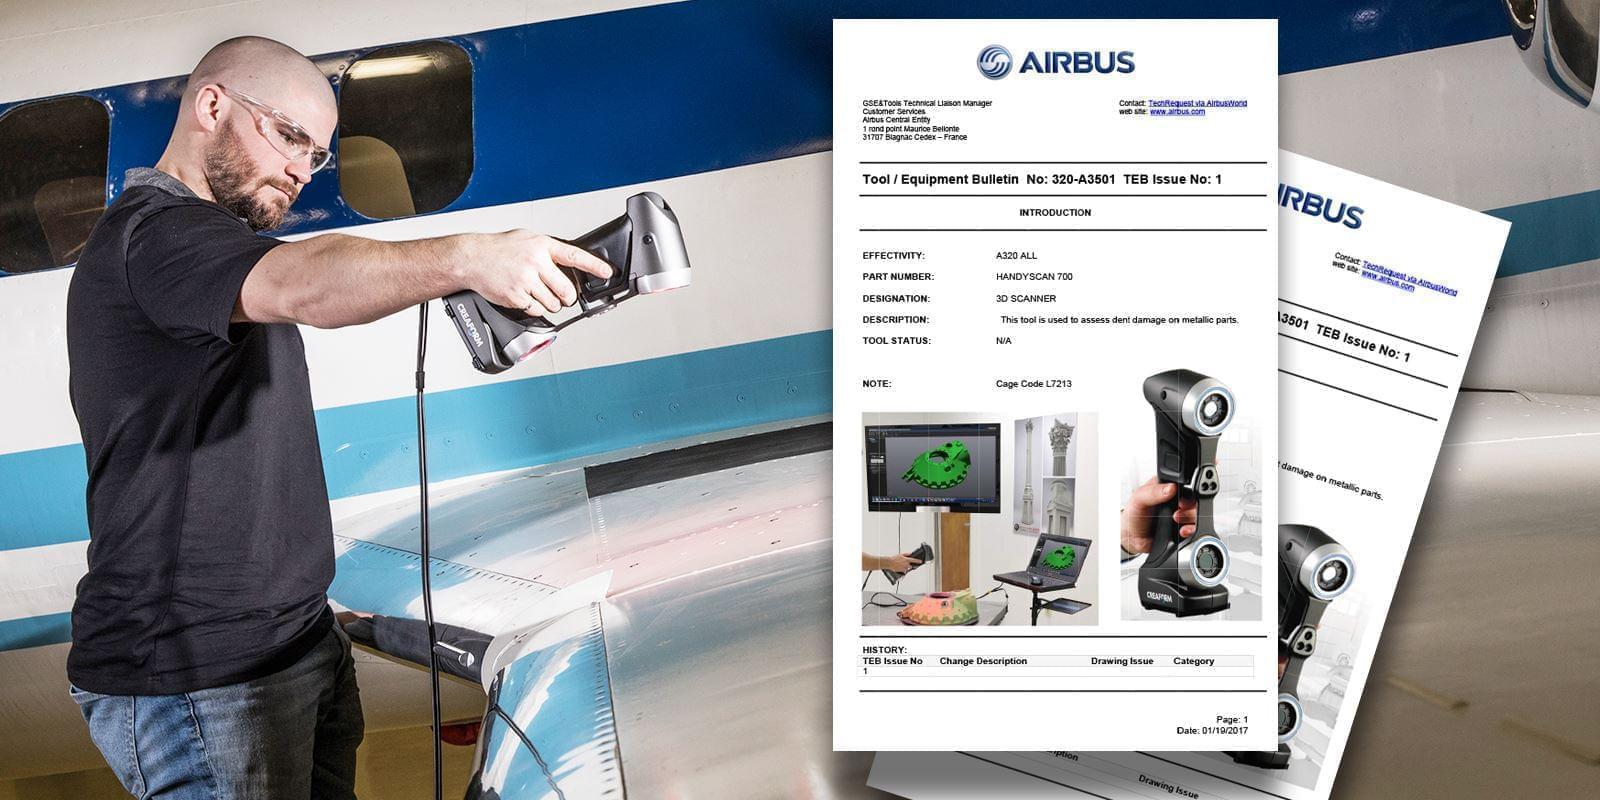 máy scan 3d máy bay